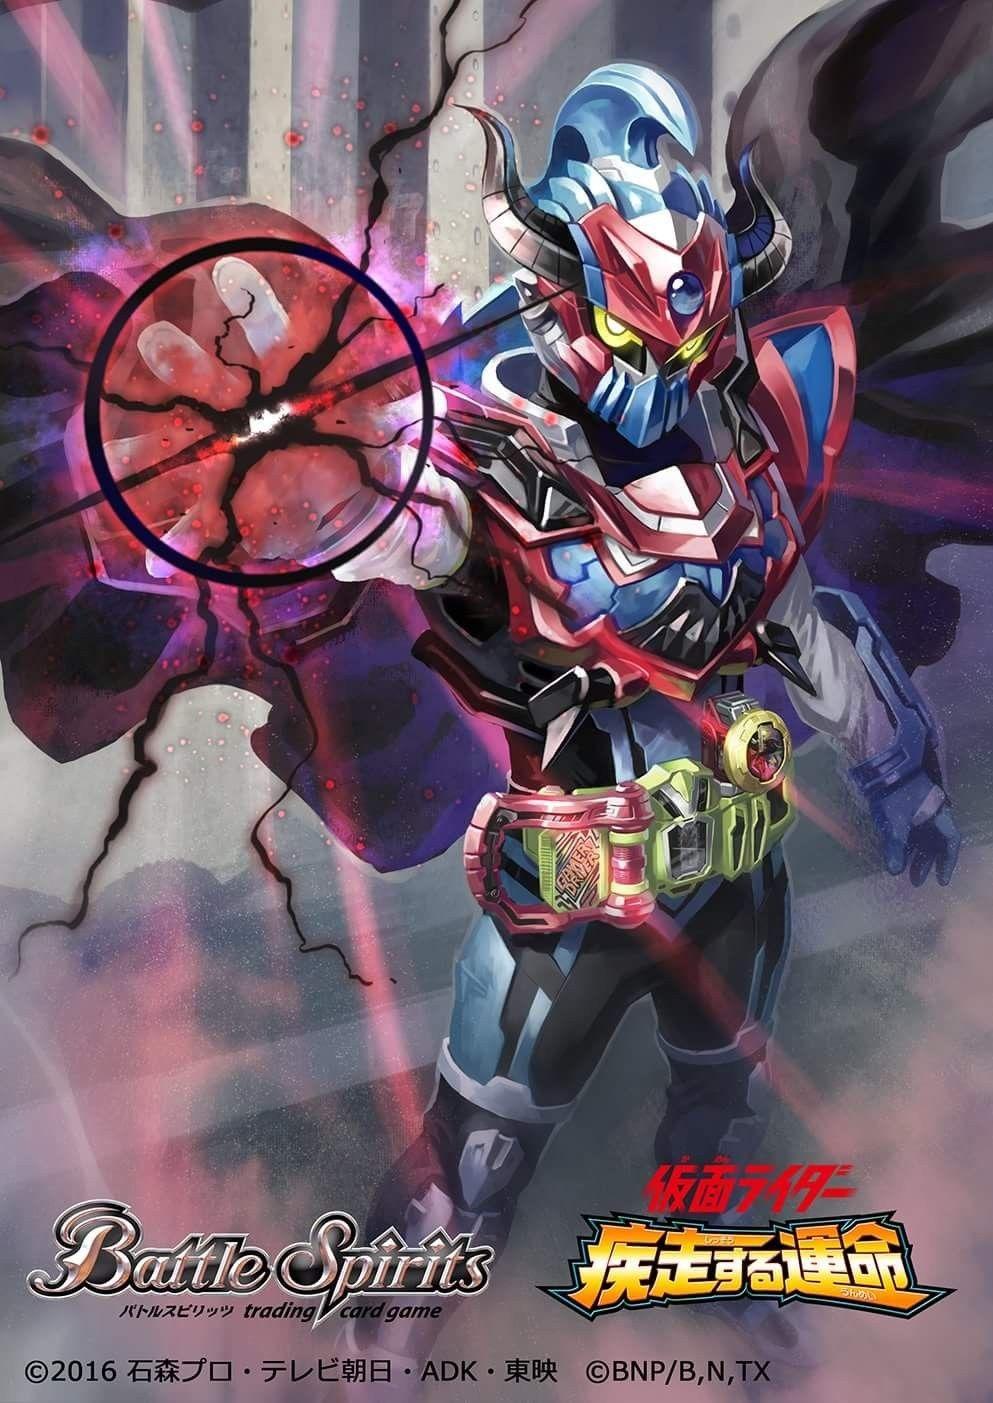 Kamen Rider Brave Fantasy Gamer Lv. 50 Seni manga, Seni